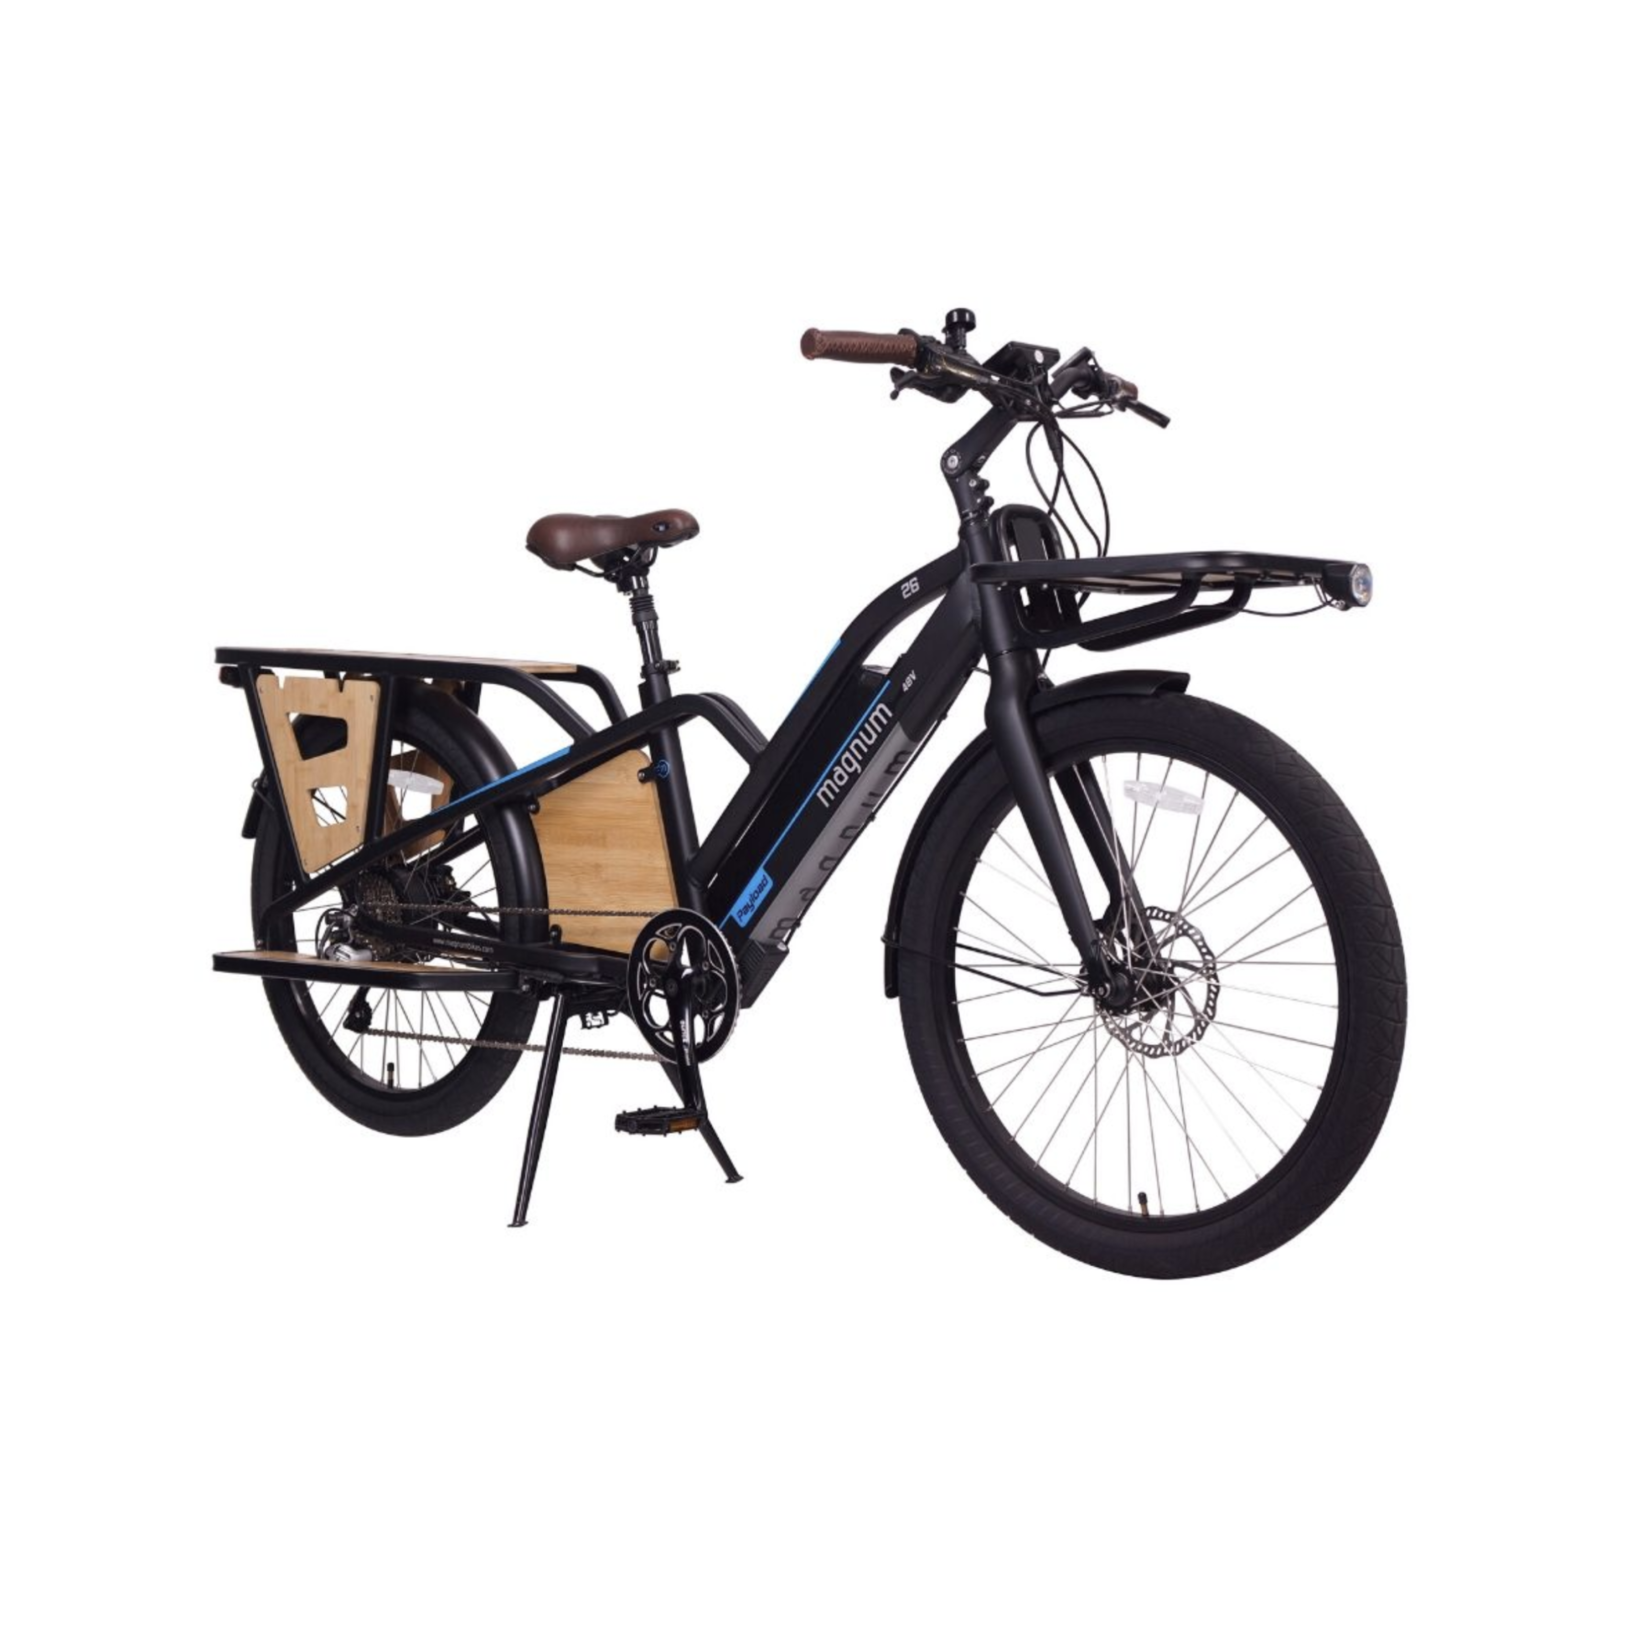 MAGNUM EBIKES Magnum Payload Cargo E-Bike 48V 18AH 500W